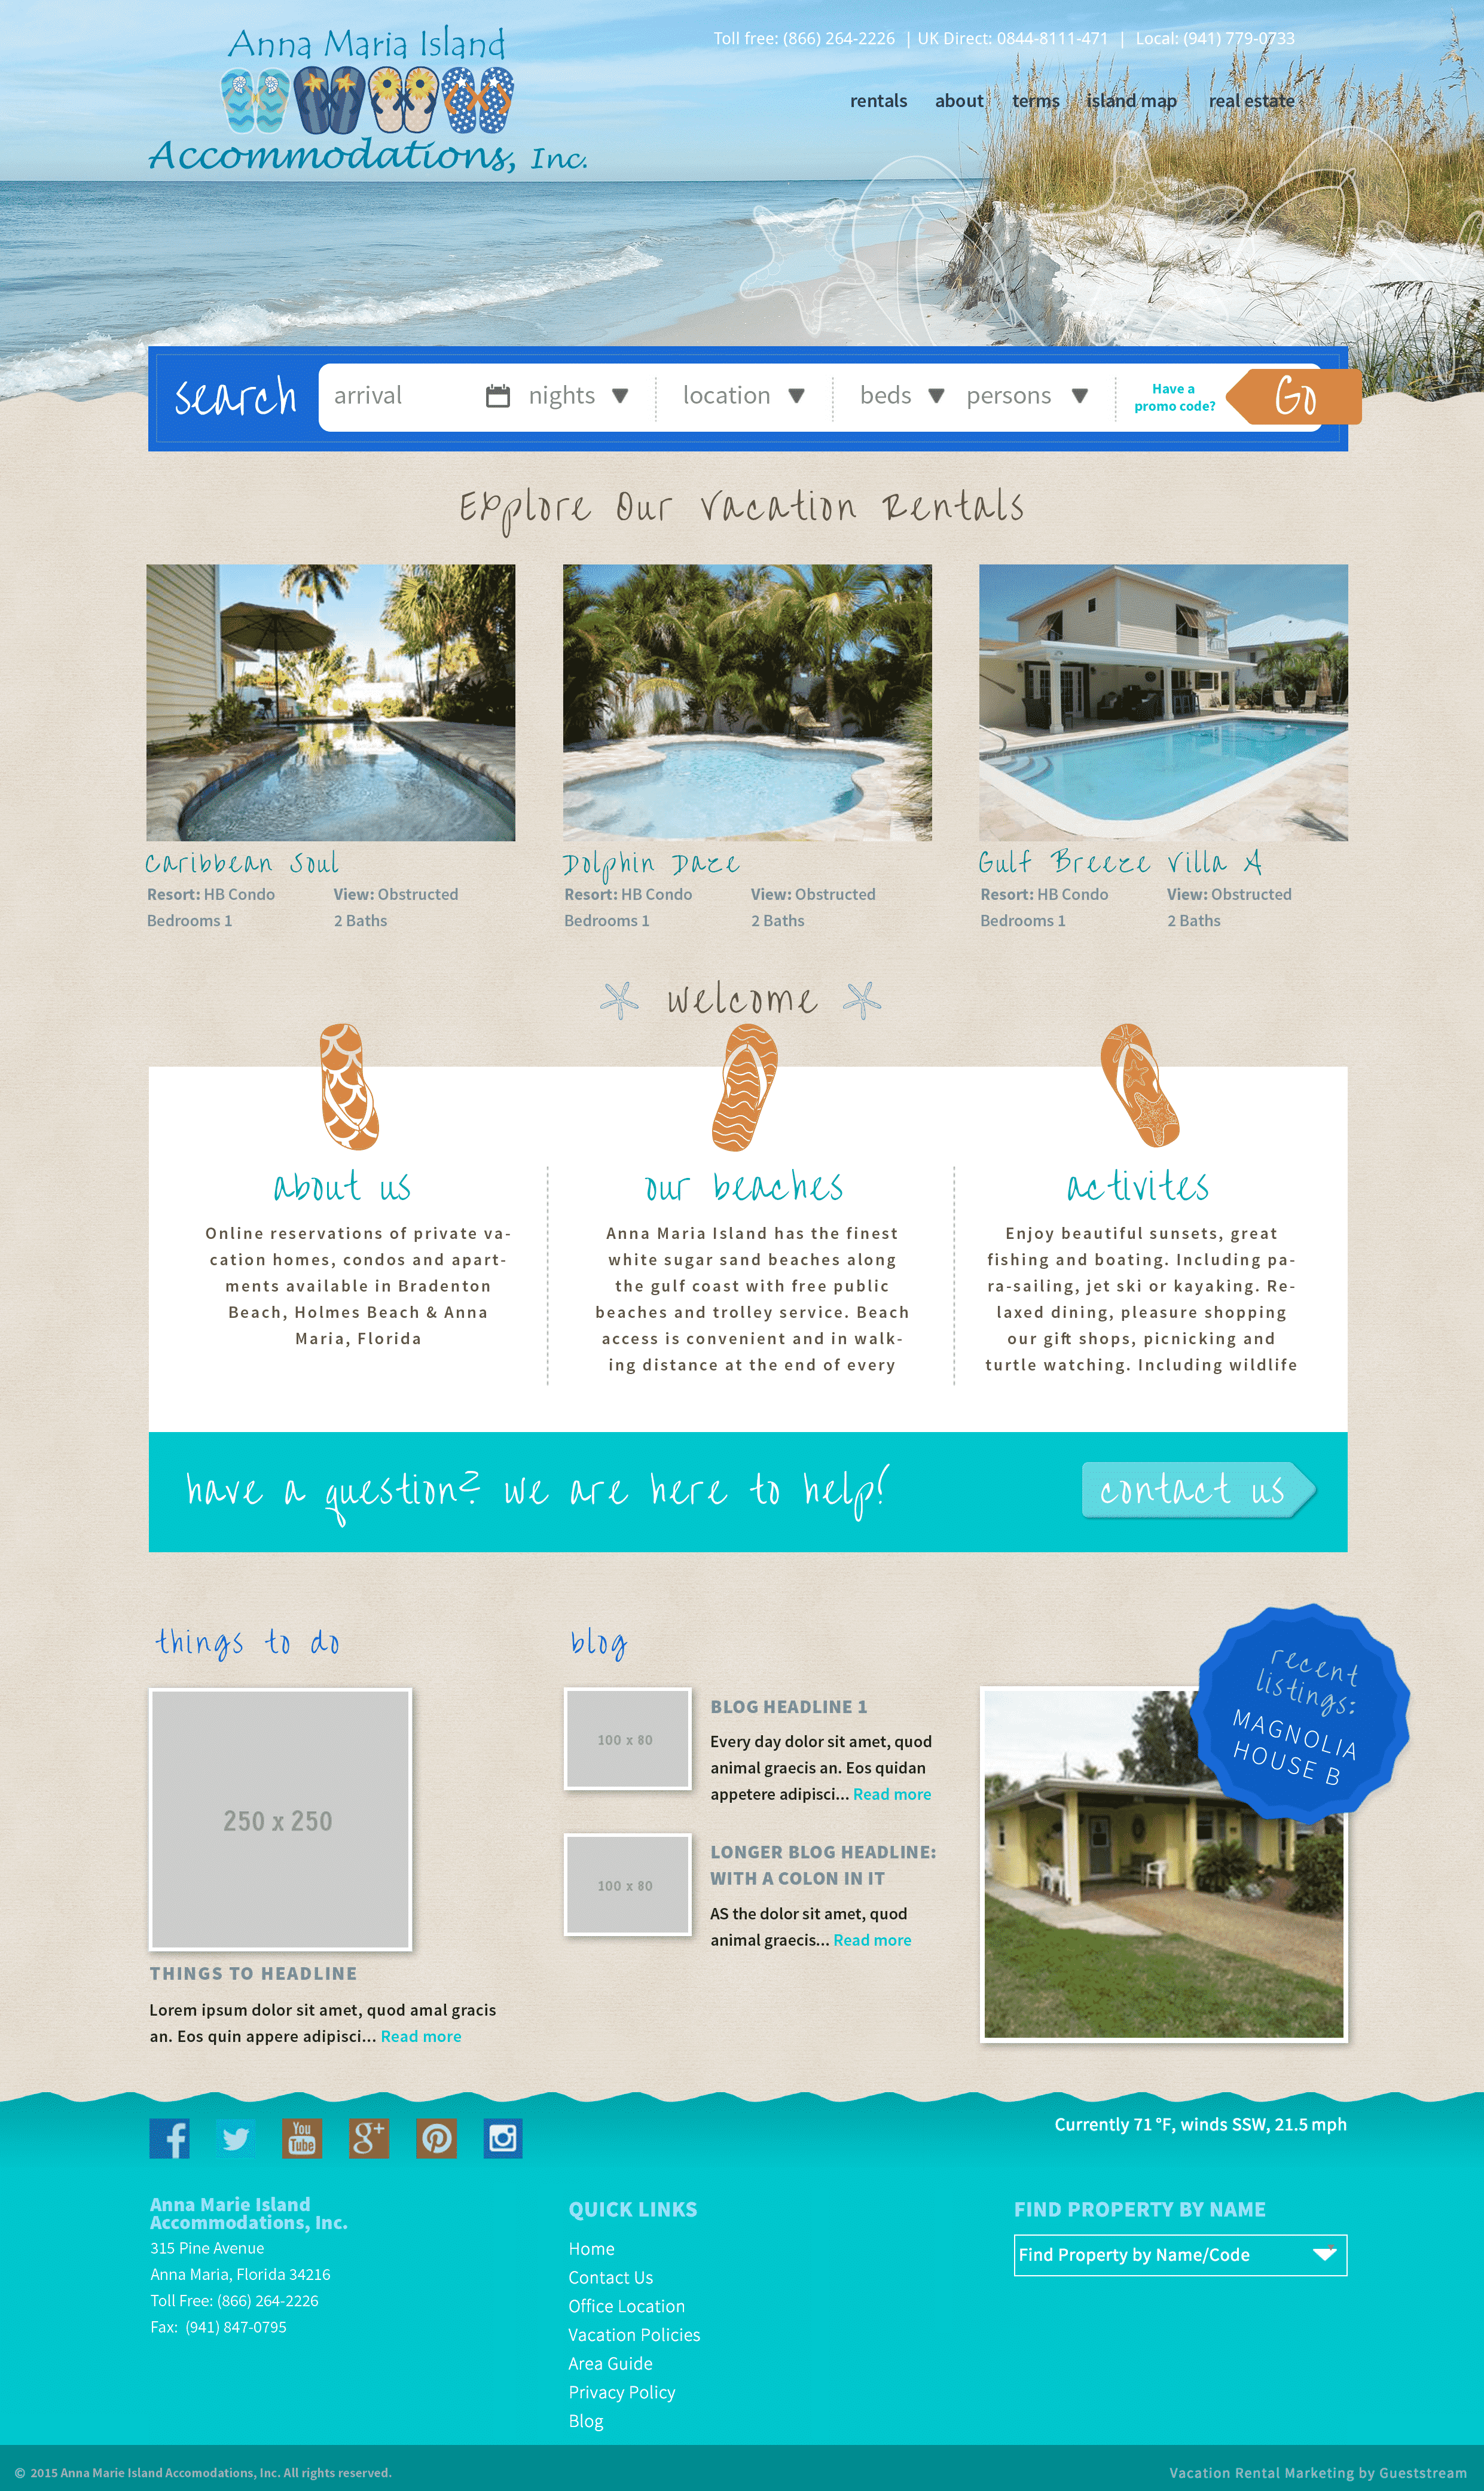 anna_maria_island_homepage